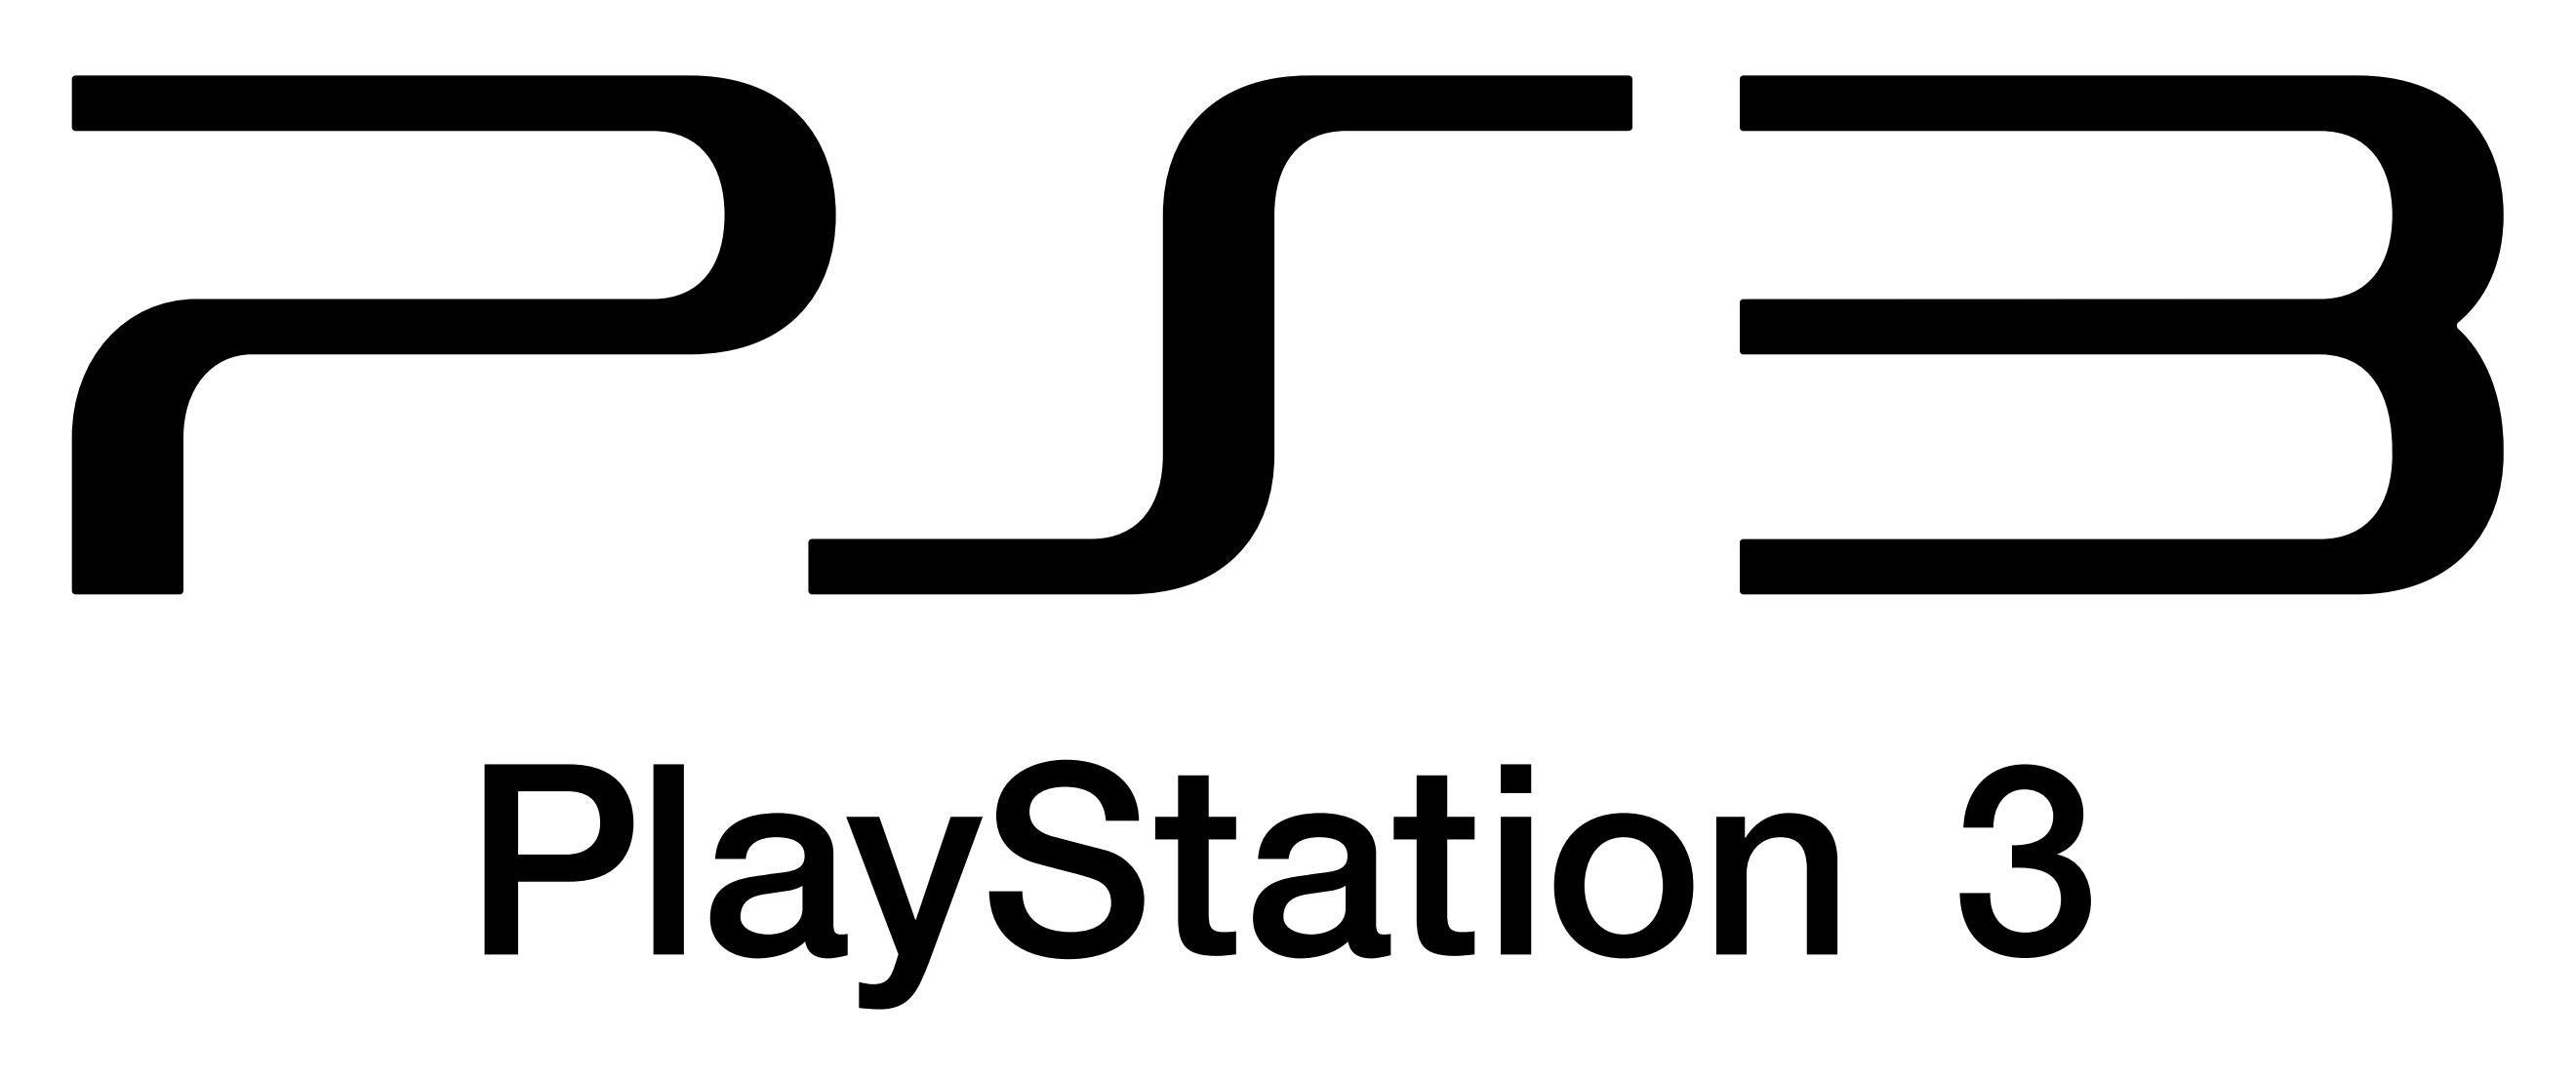 ps3  u2013 playstation 3 logo vector  eps file